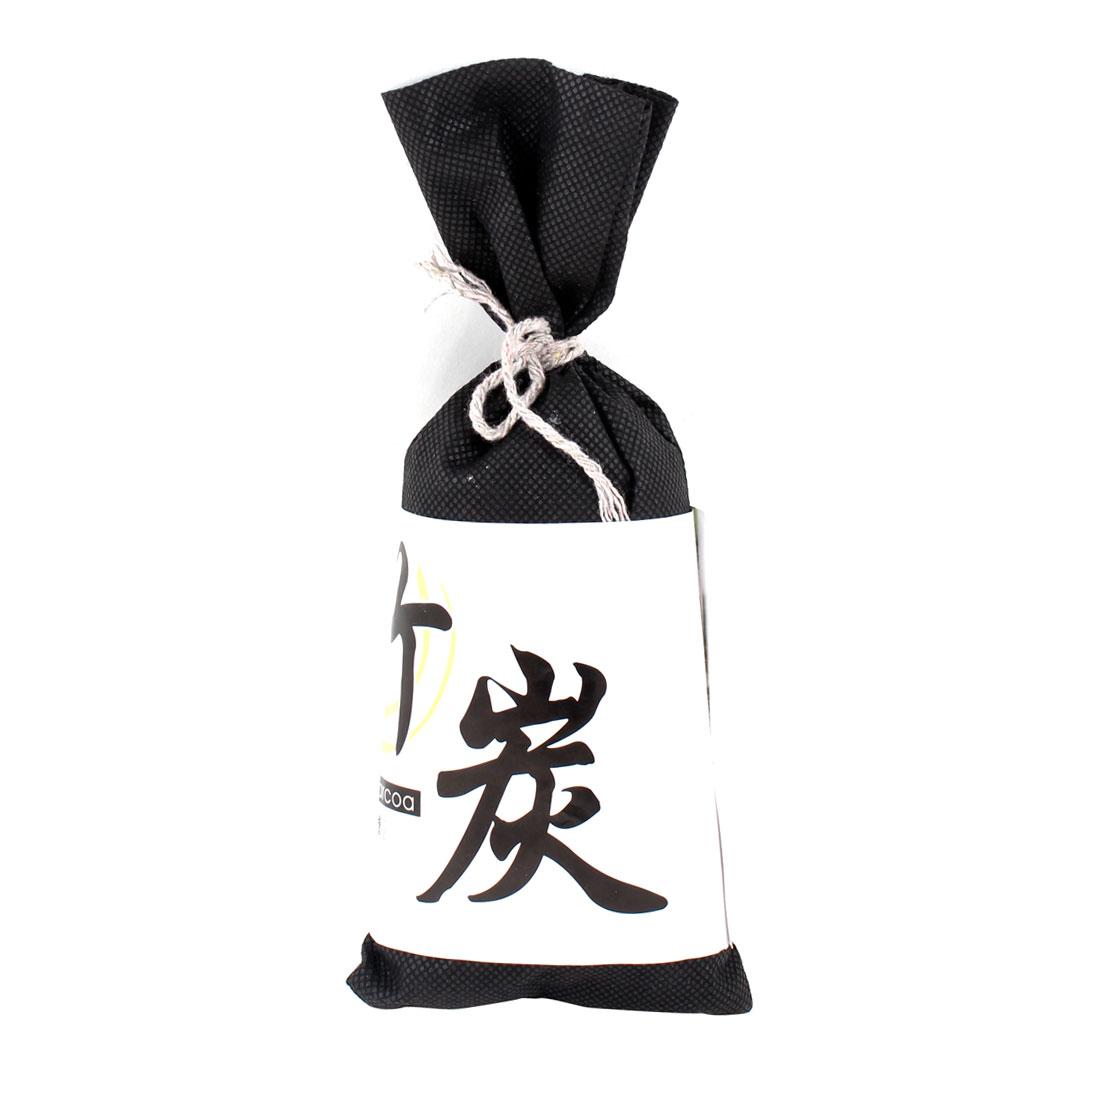 Auto Car Deodorant Bamboo Charcoal Bag Holder Decor Air Freshener Black